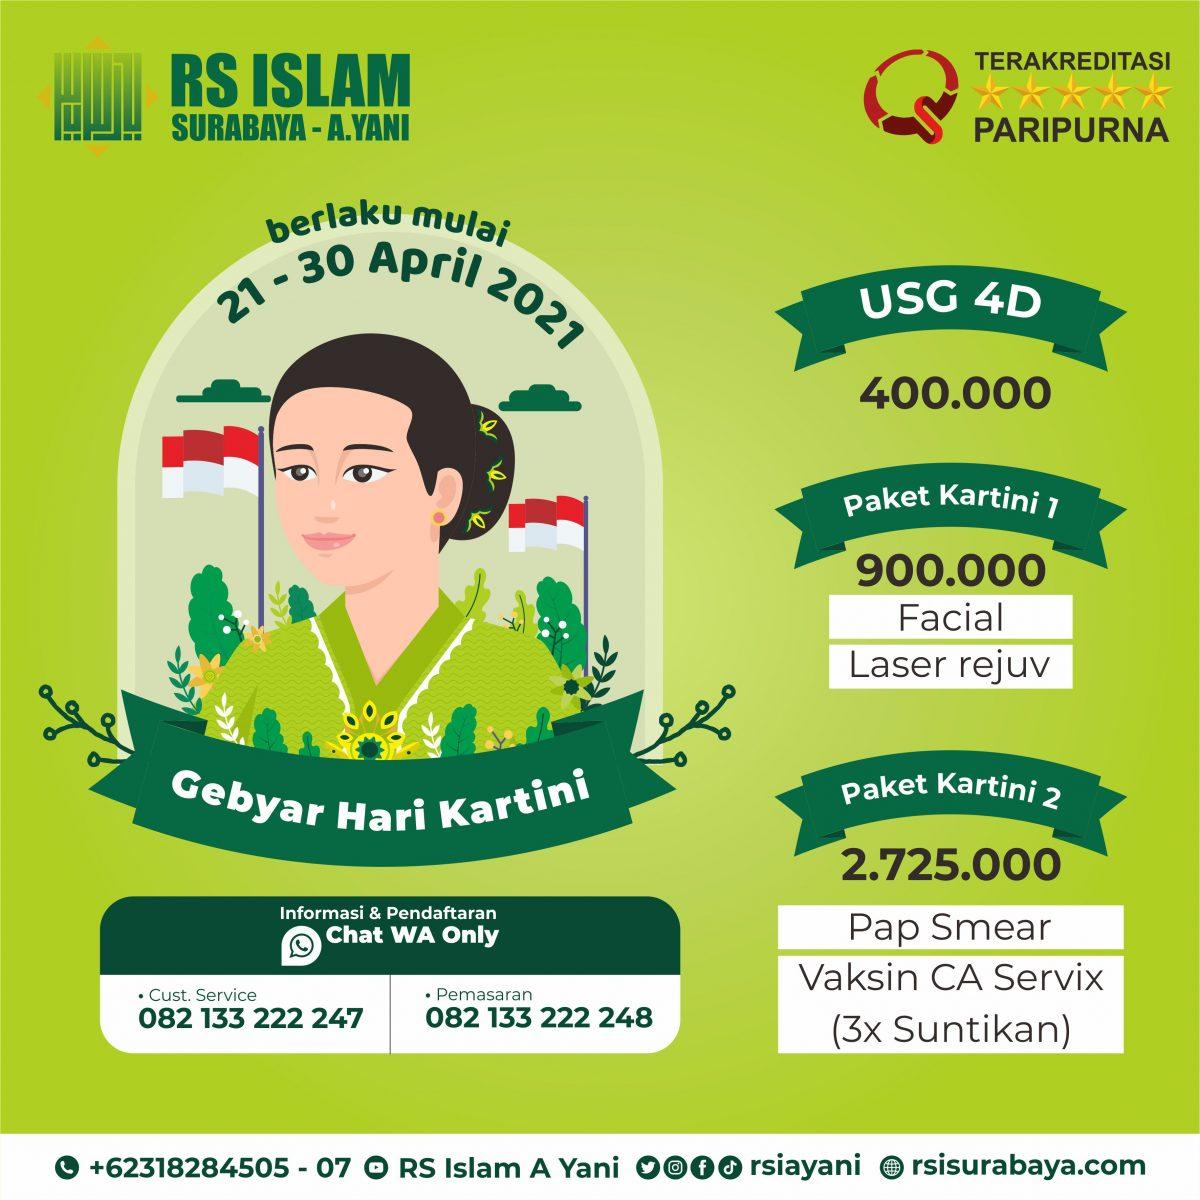 Gebyar-Hari-Kartini-1200x1200.jpg